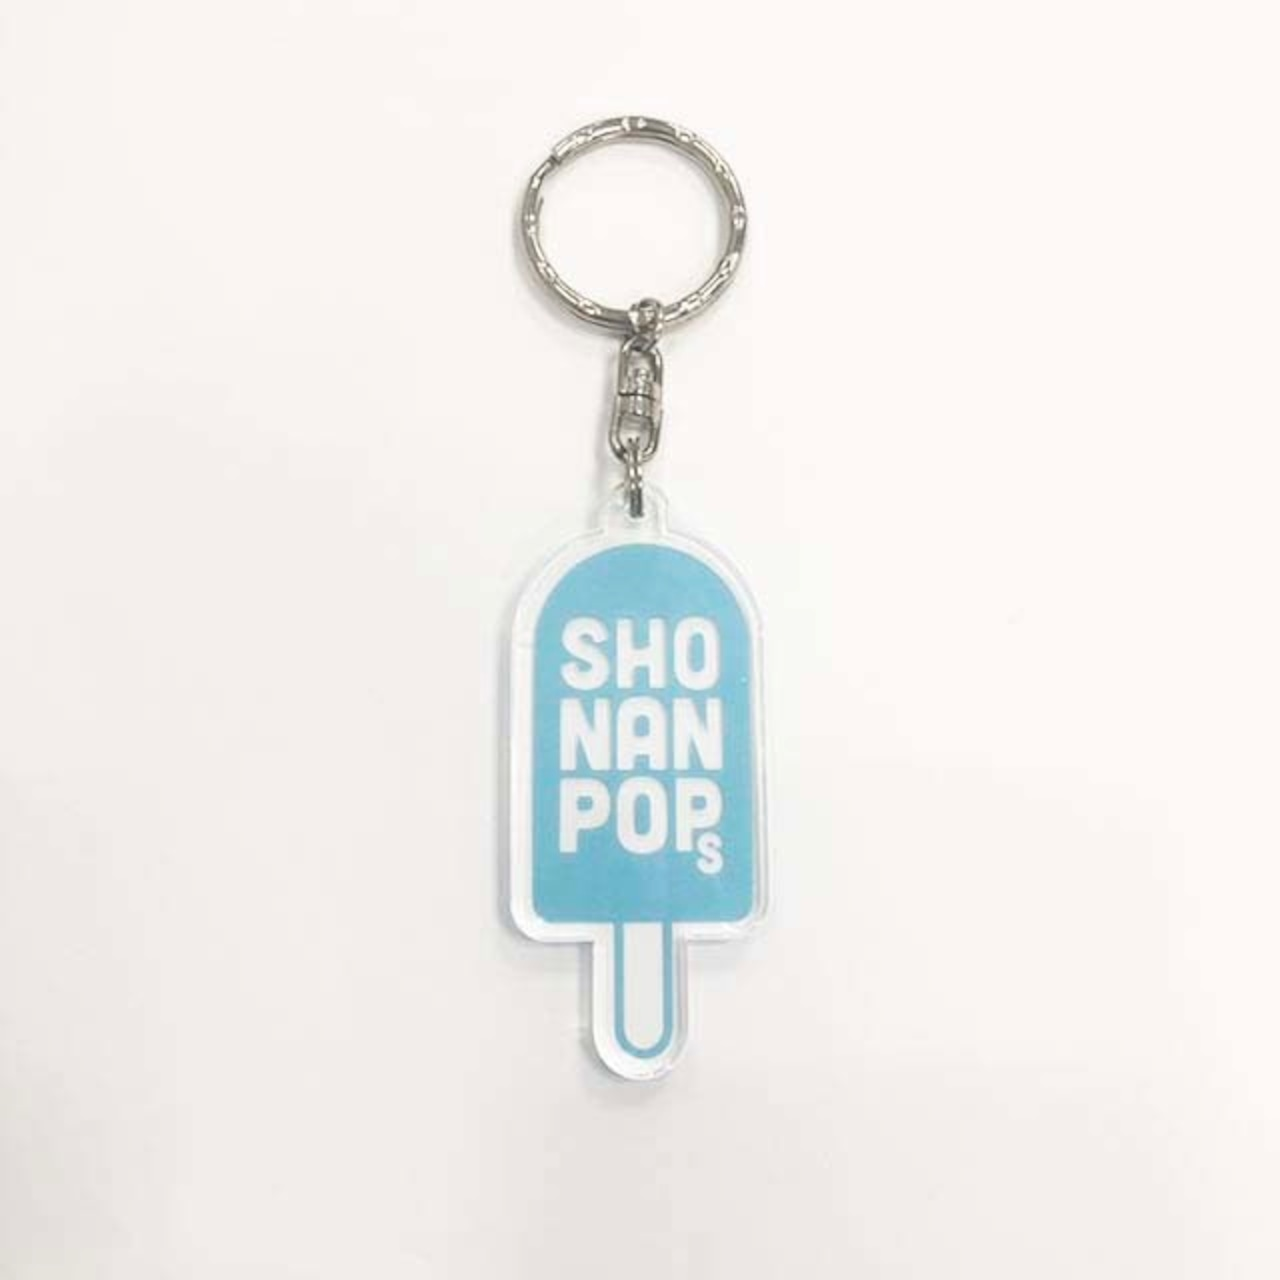 【SHONAN POPs】キーホルダー(S)